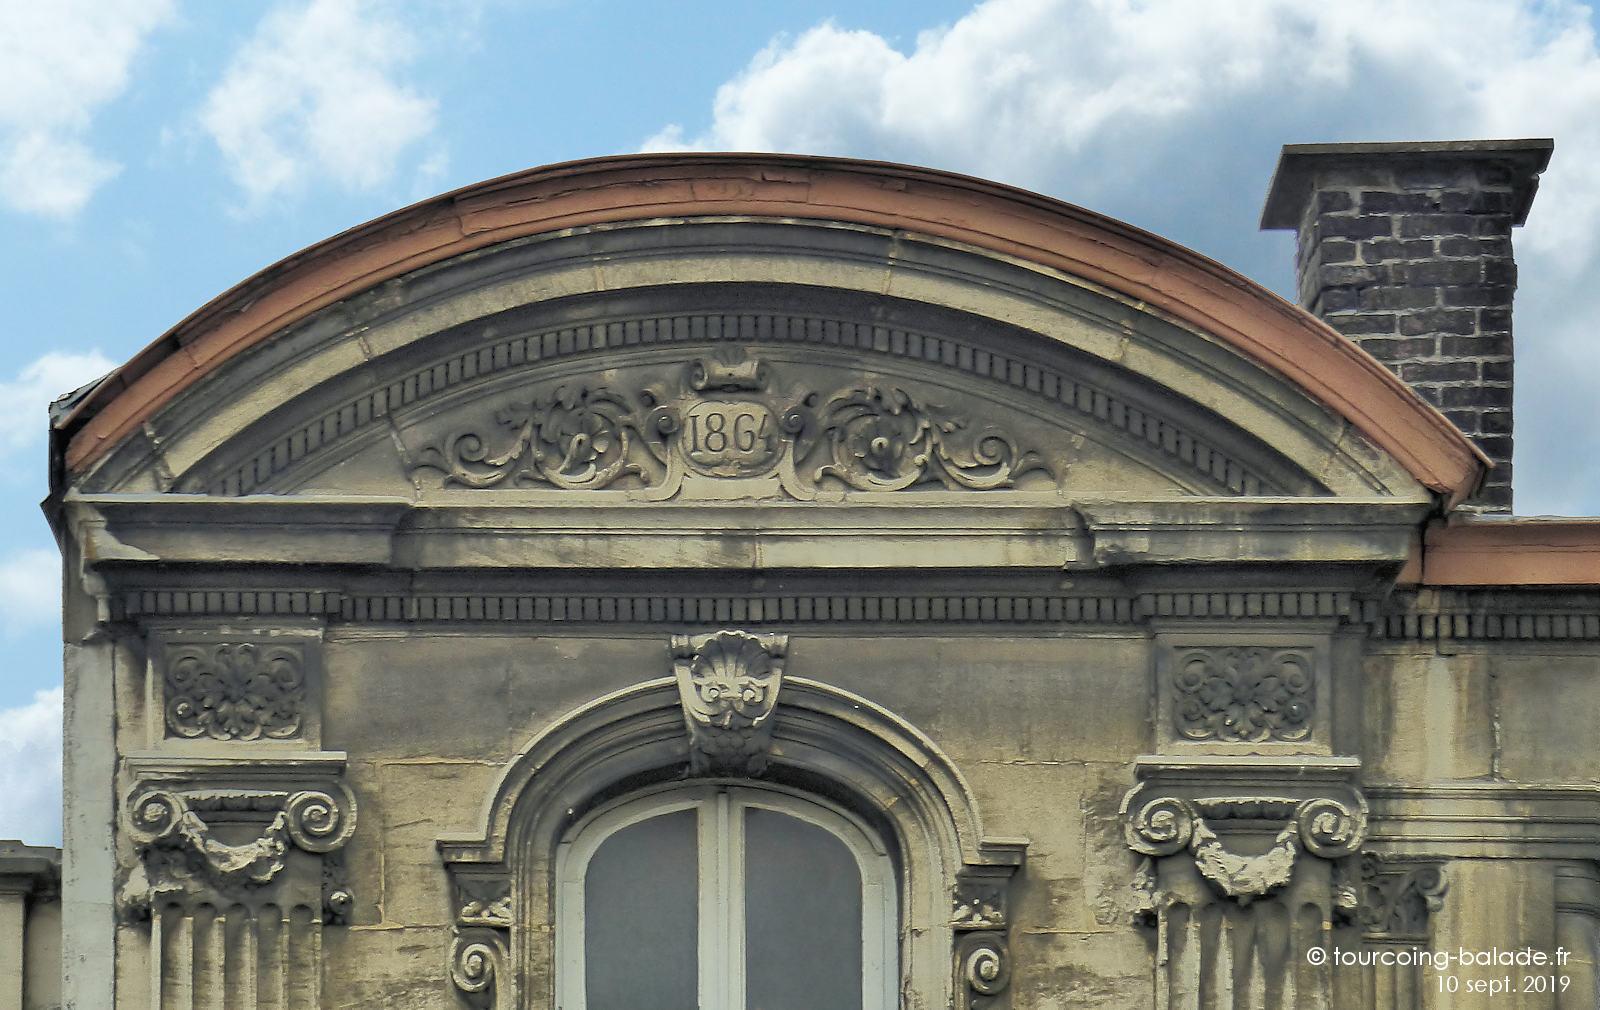 Couvent des Bénédictines, Tourcoing - Fronton cintré.